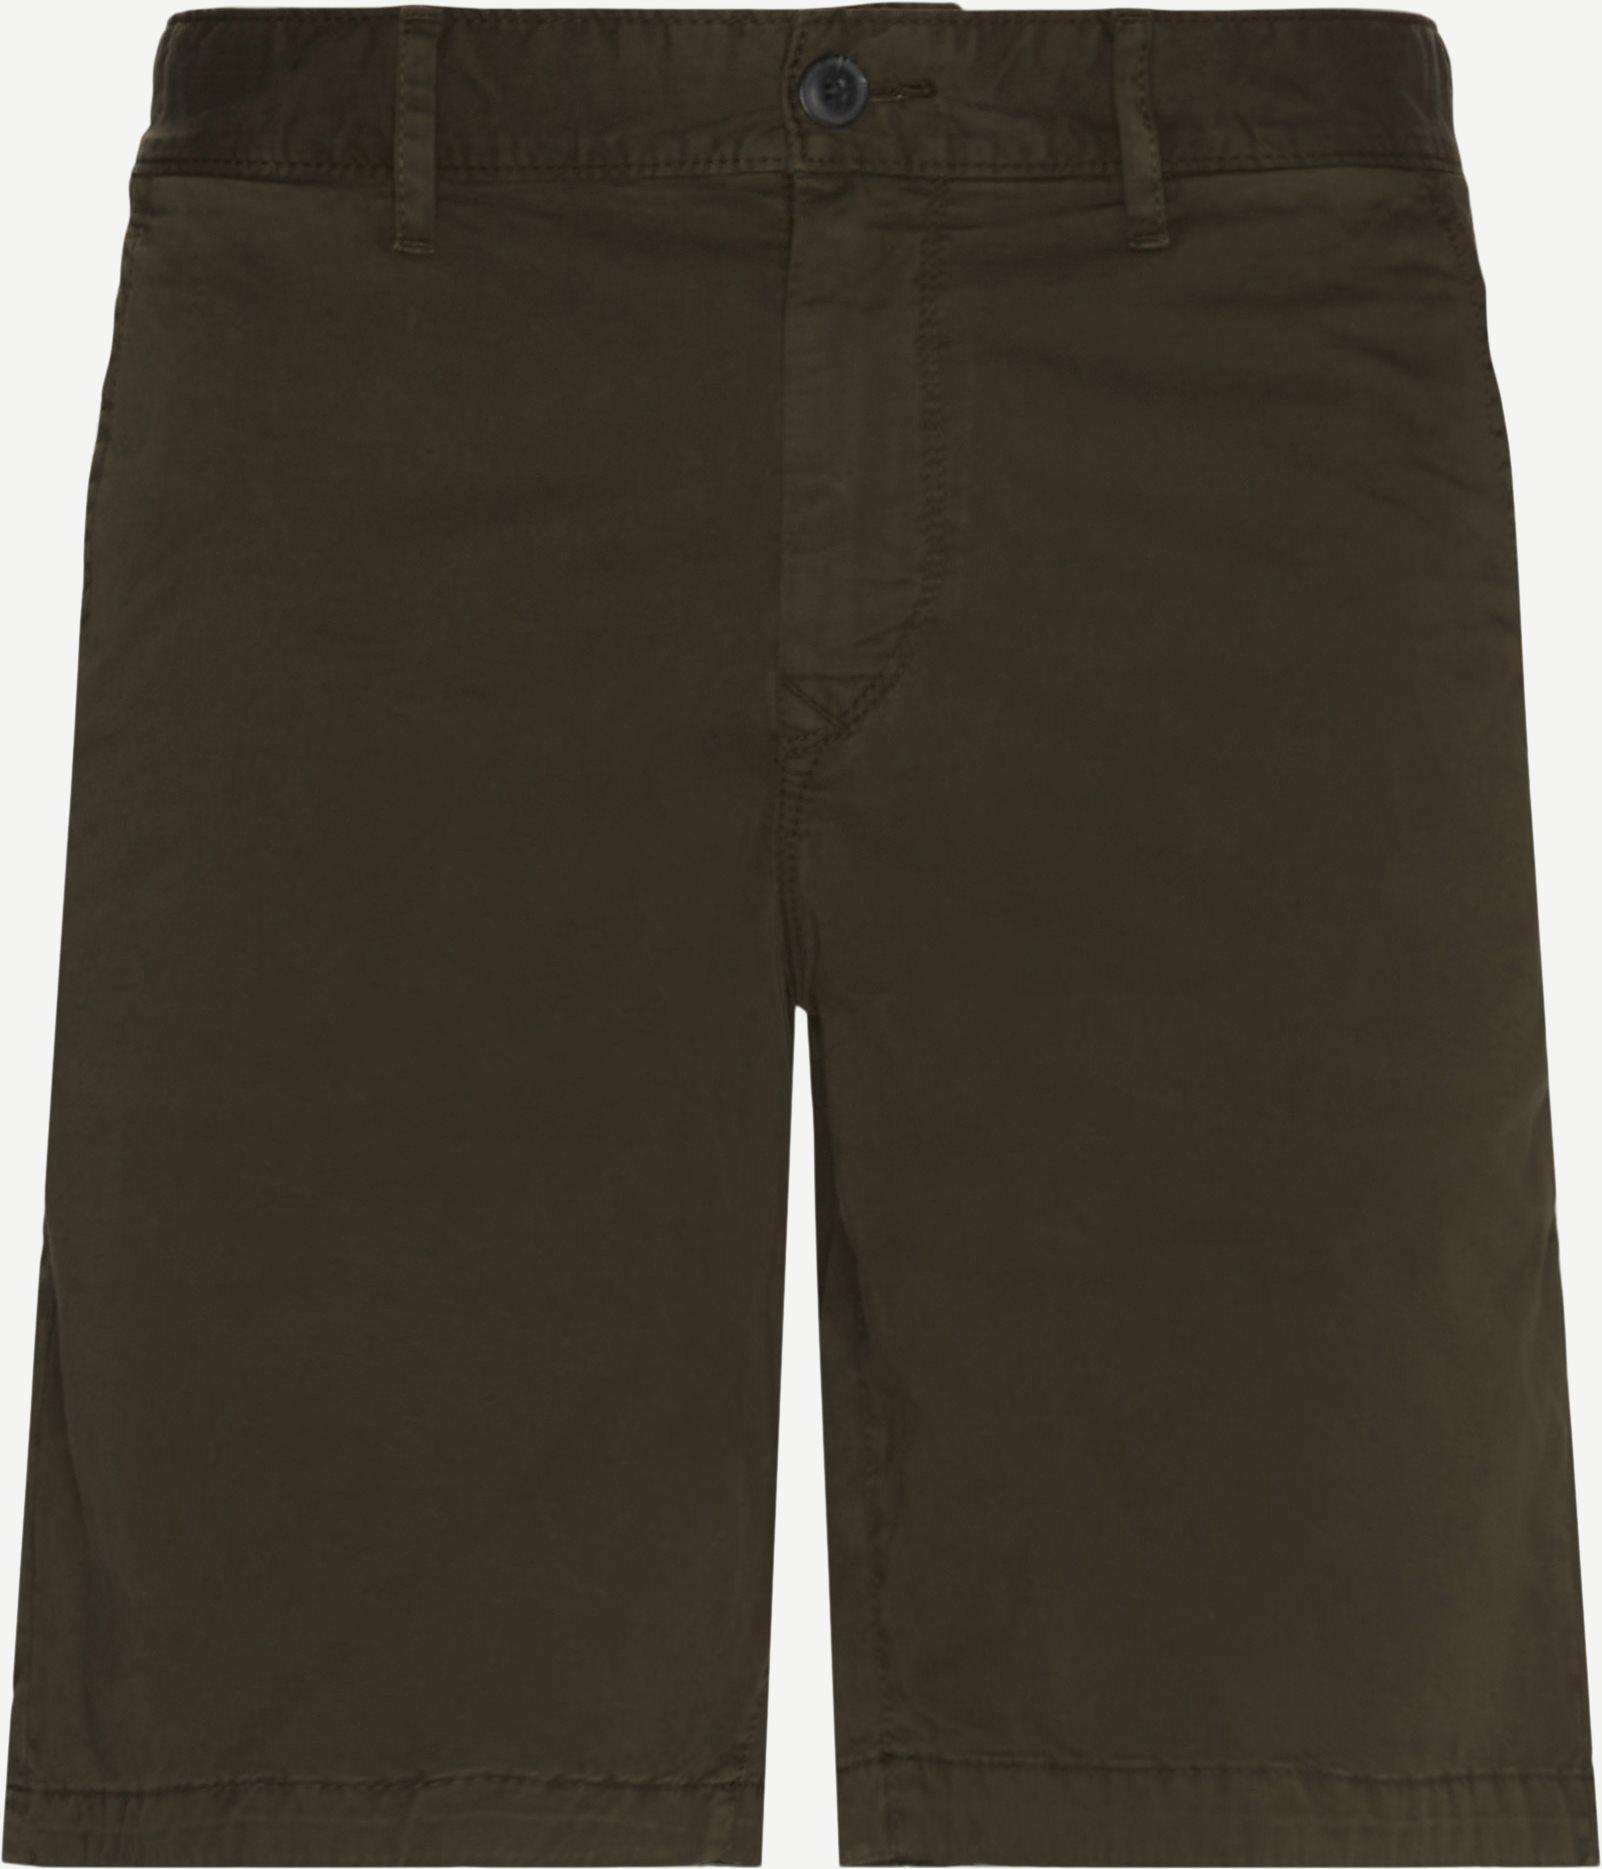 Shorts - Slim fit - Armé